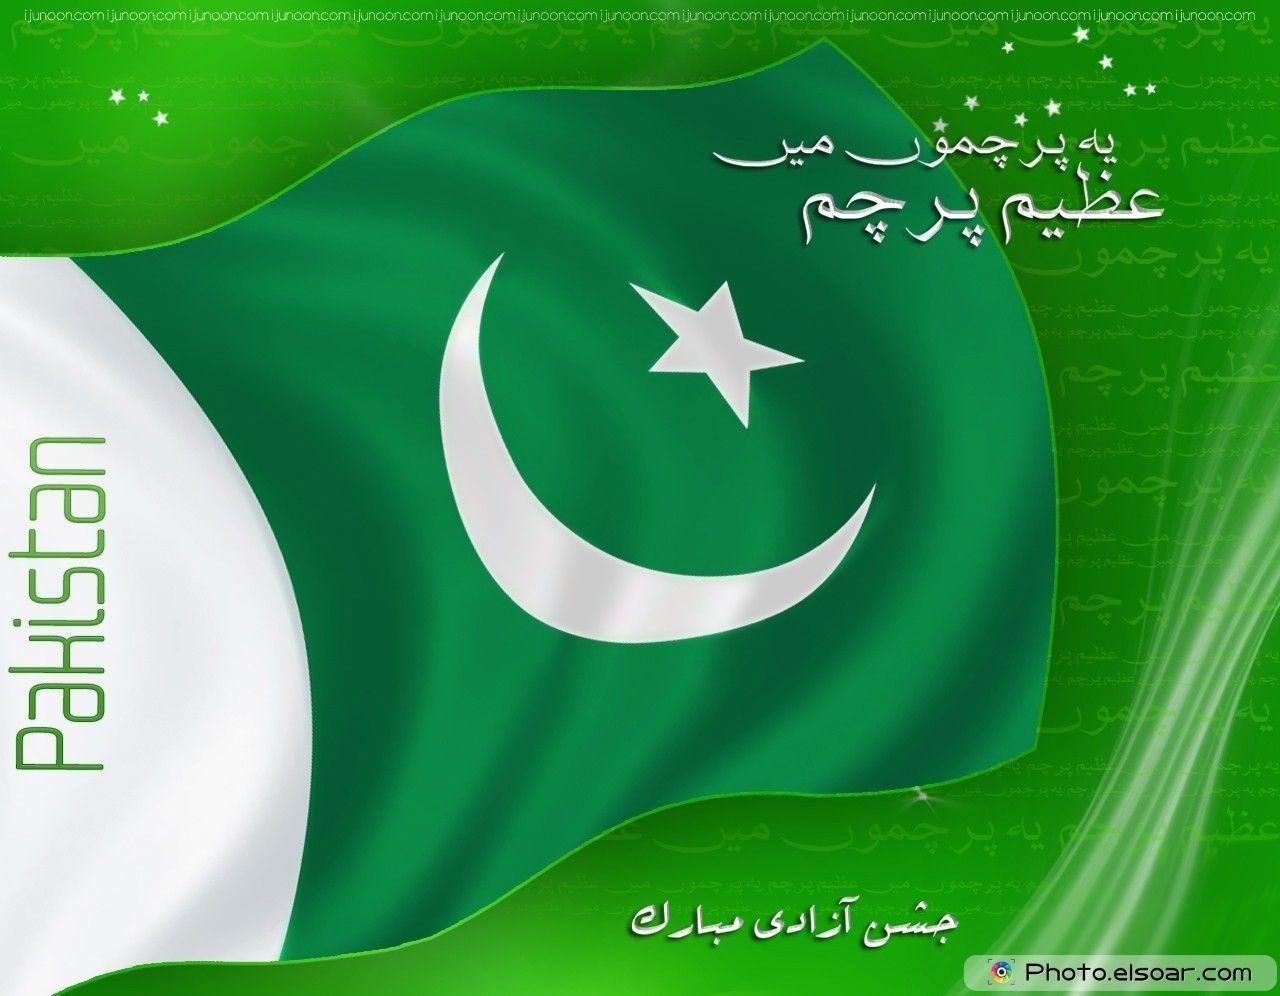 14 august pakistan wallpaper full - photo #25